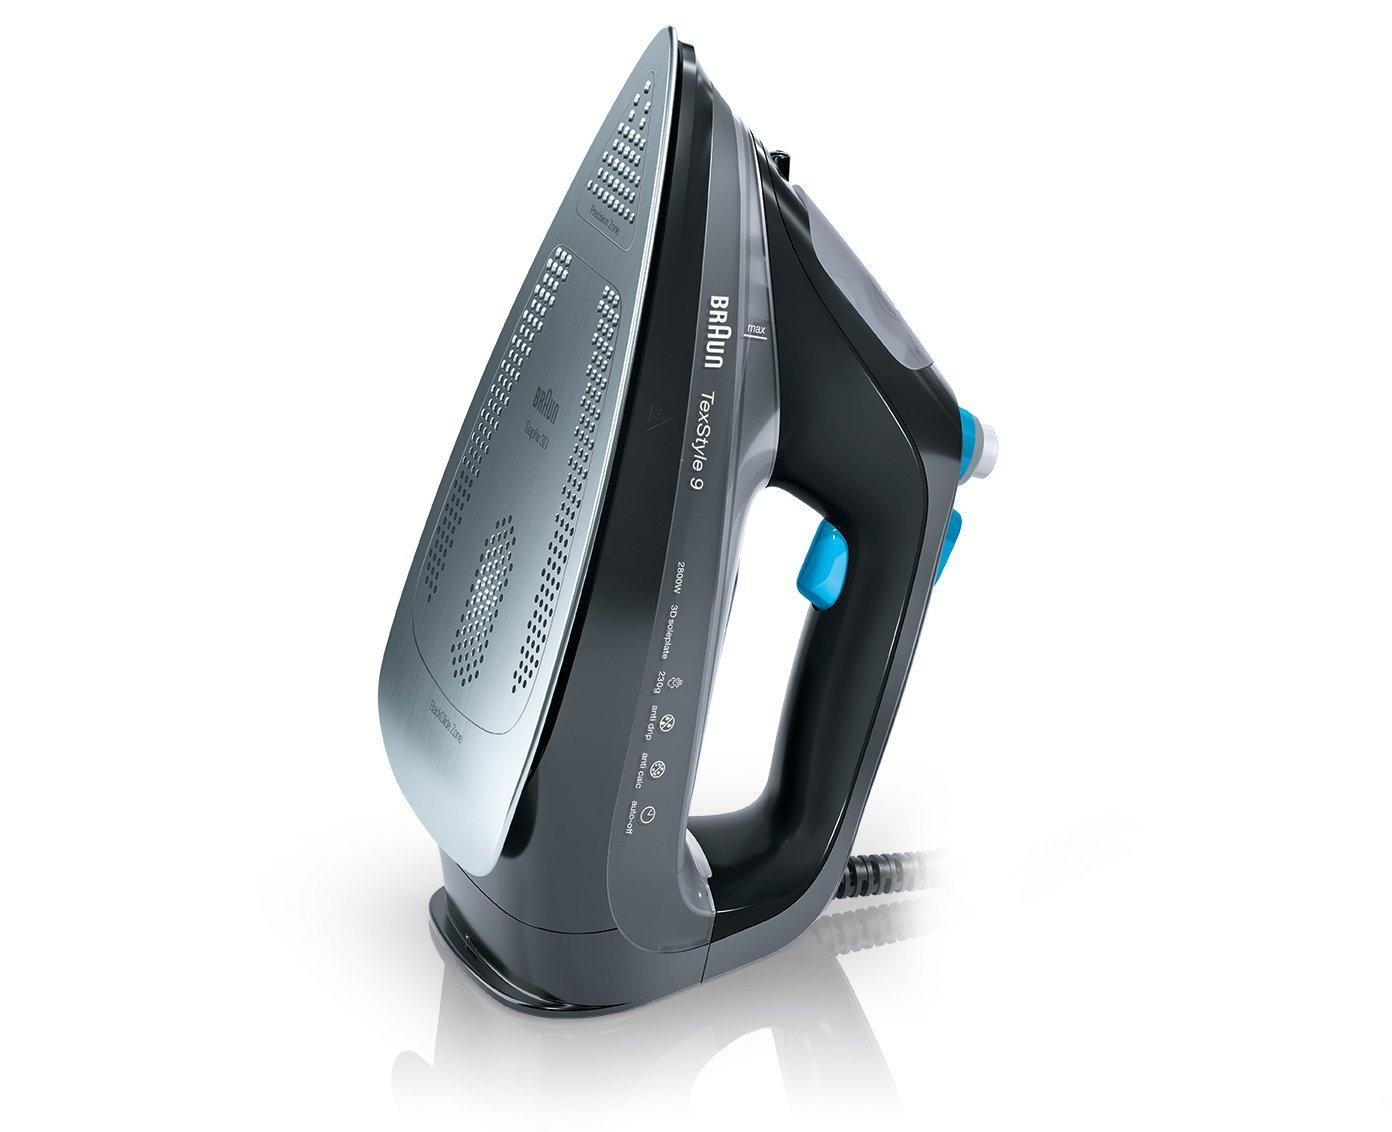 Braun TexStyle 9 SI 9188 - 2800W - black Gludeklis